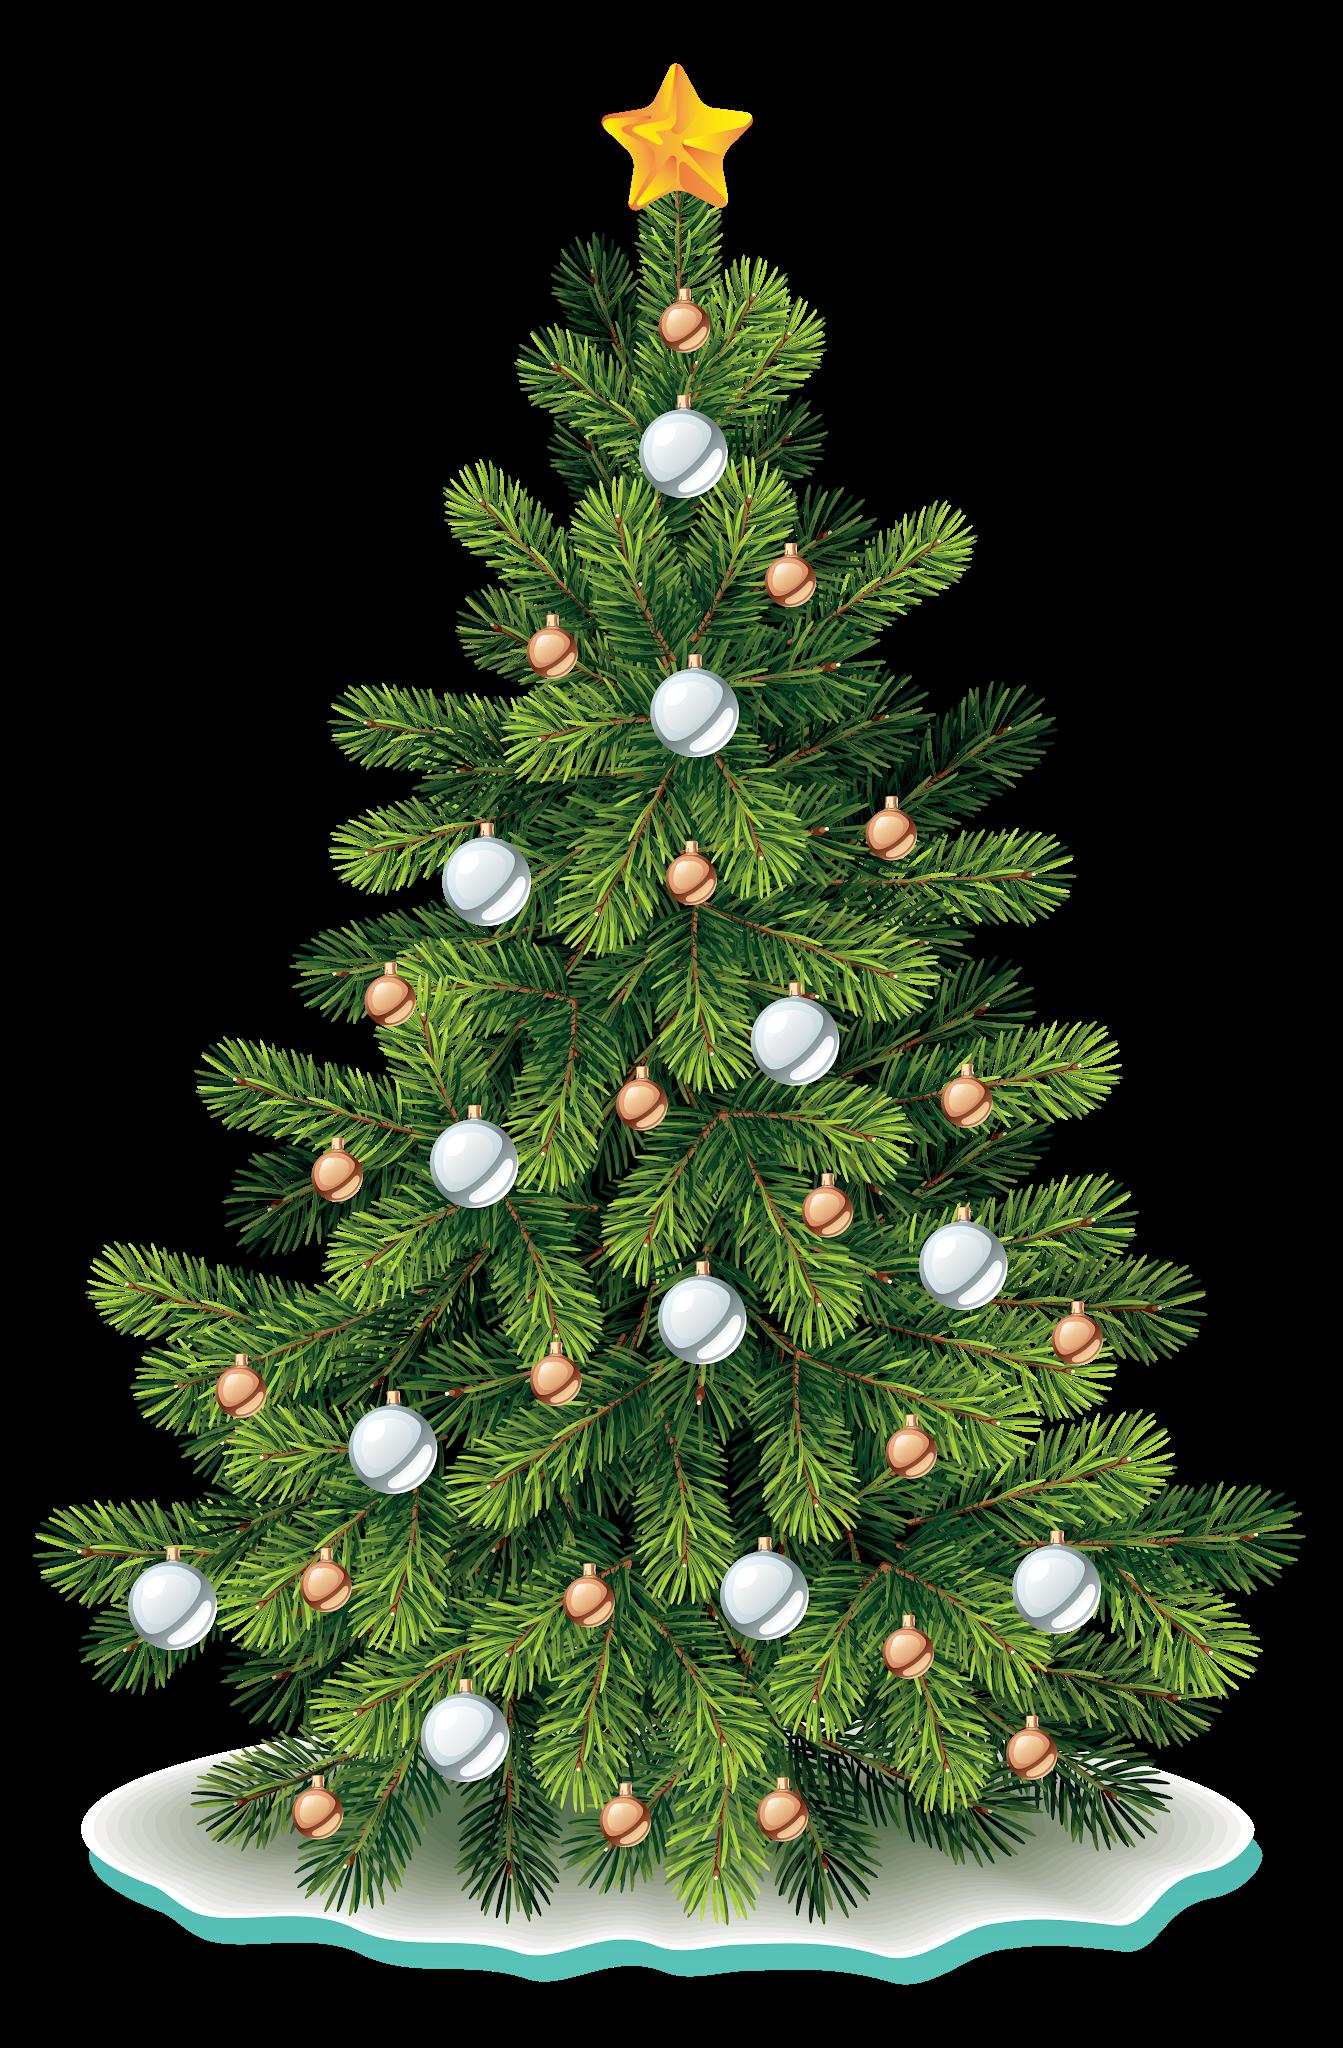 Christmas Tree Png Vector Christmas Png Image Clipart Tree Illustration Christmas Images Christmas Drawing